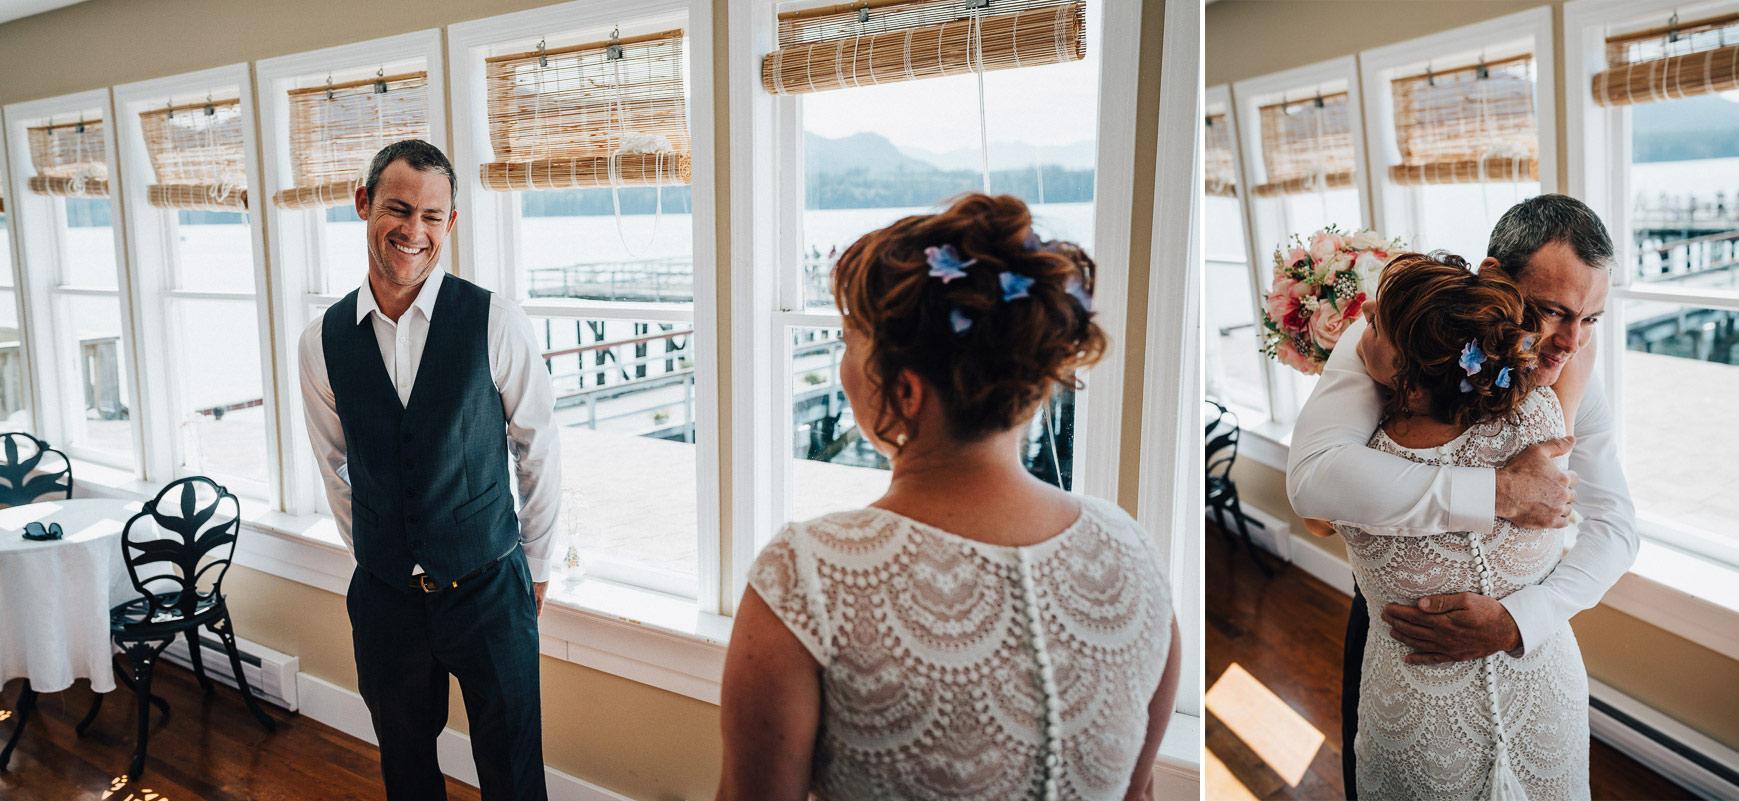 perth-destination-wedding-photographer-33.jpg